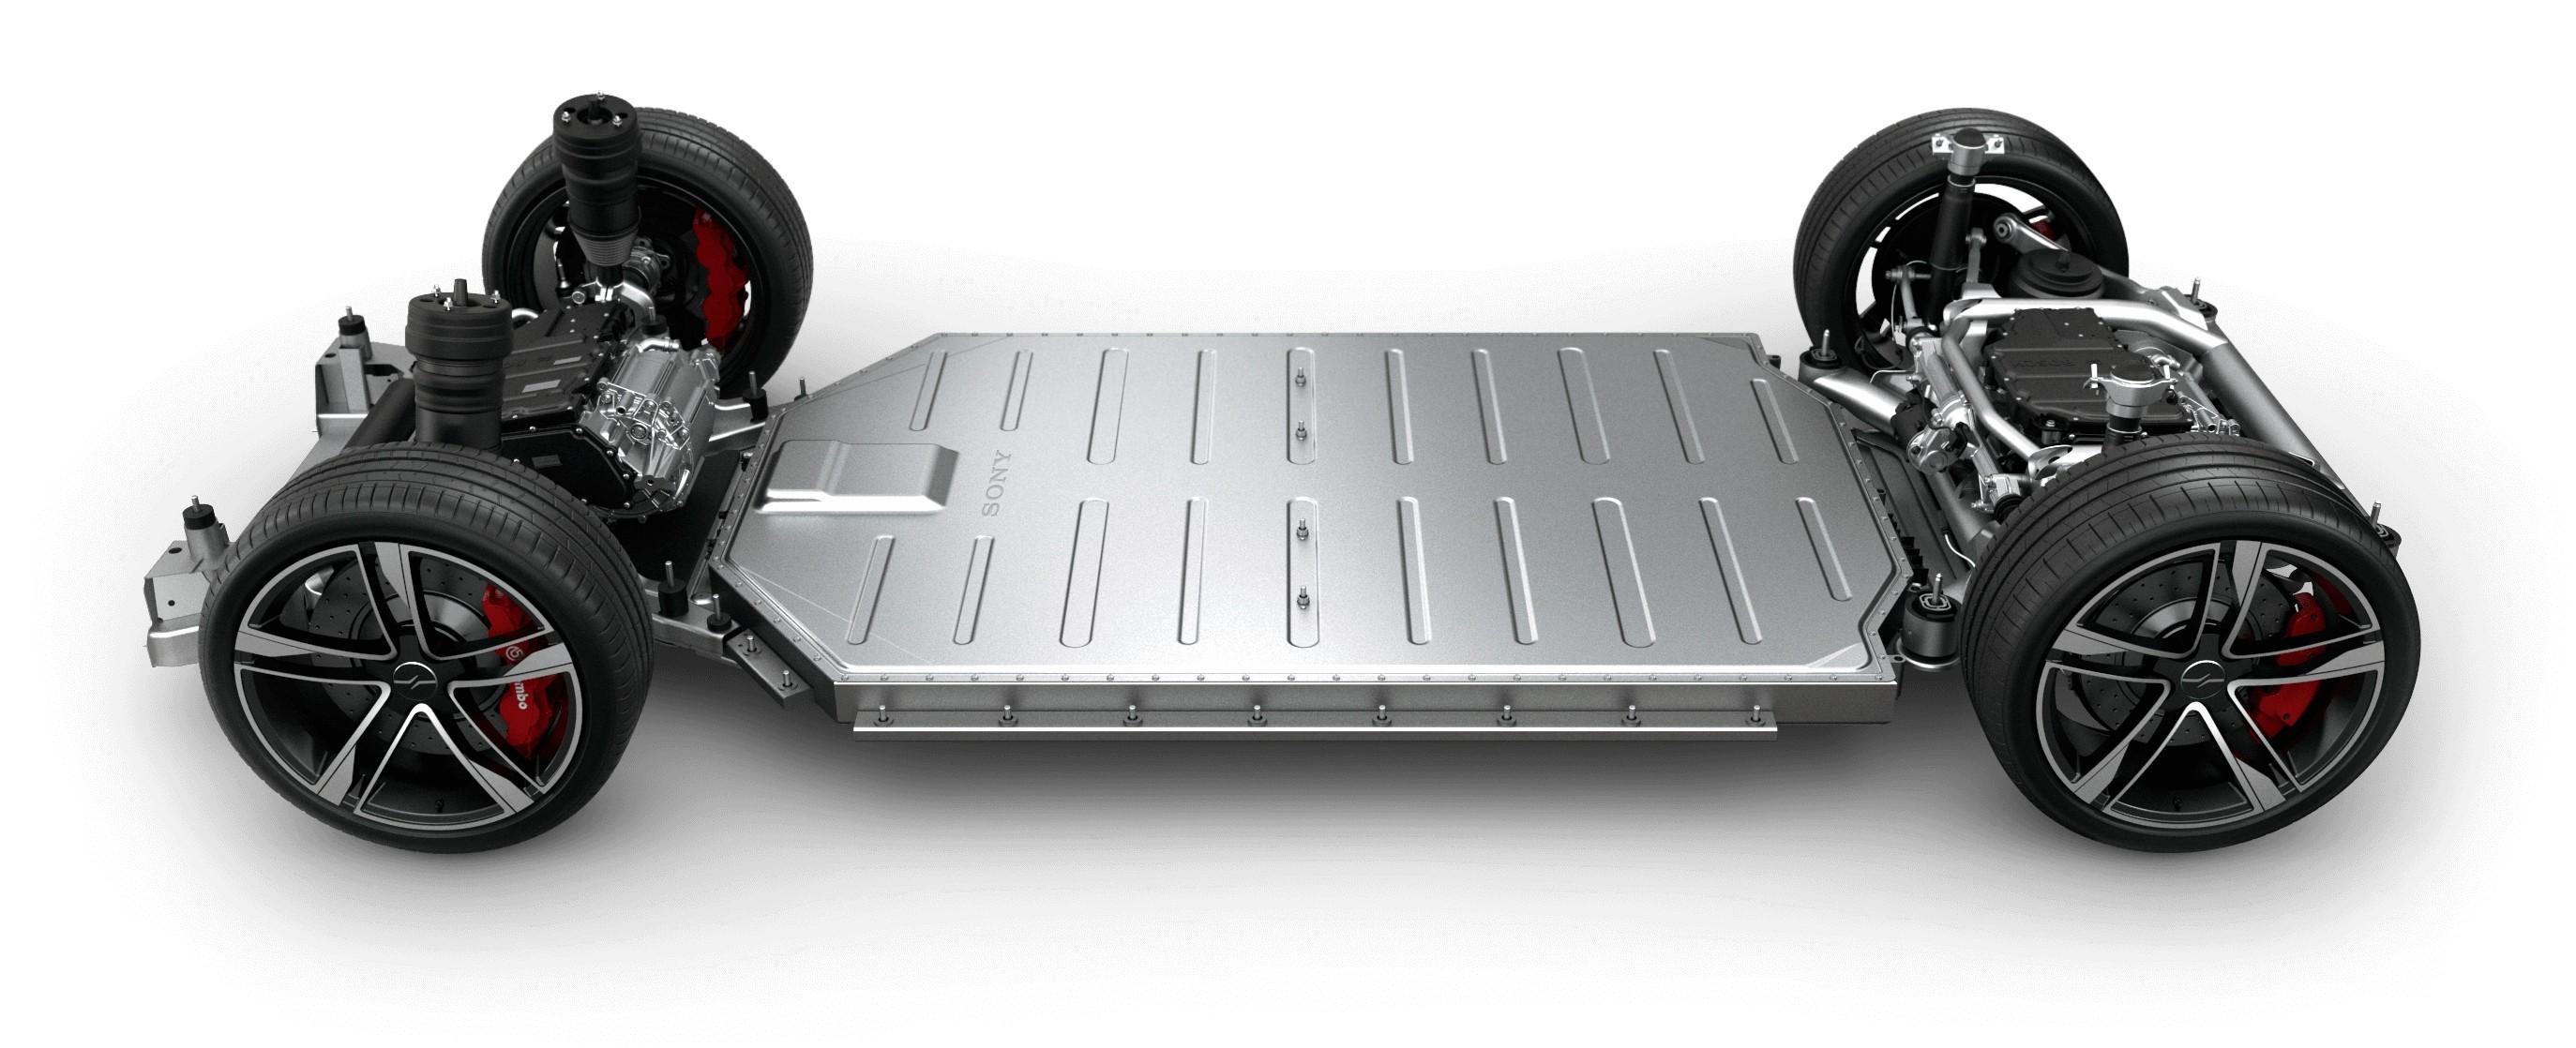 Electric vehicle platform 'skateboard